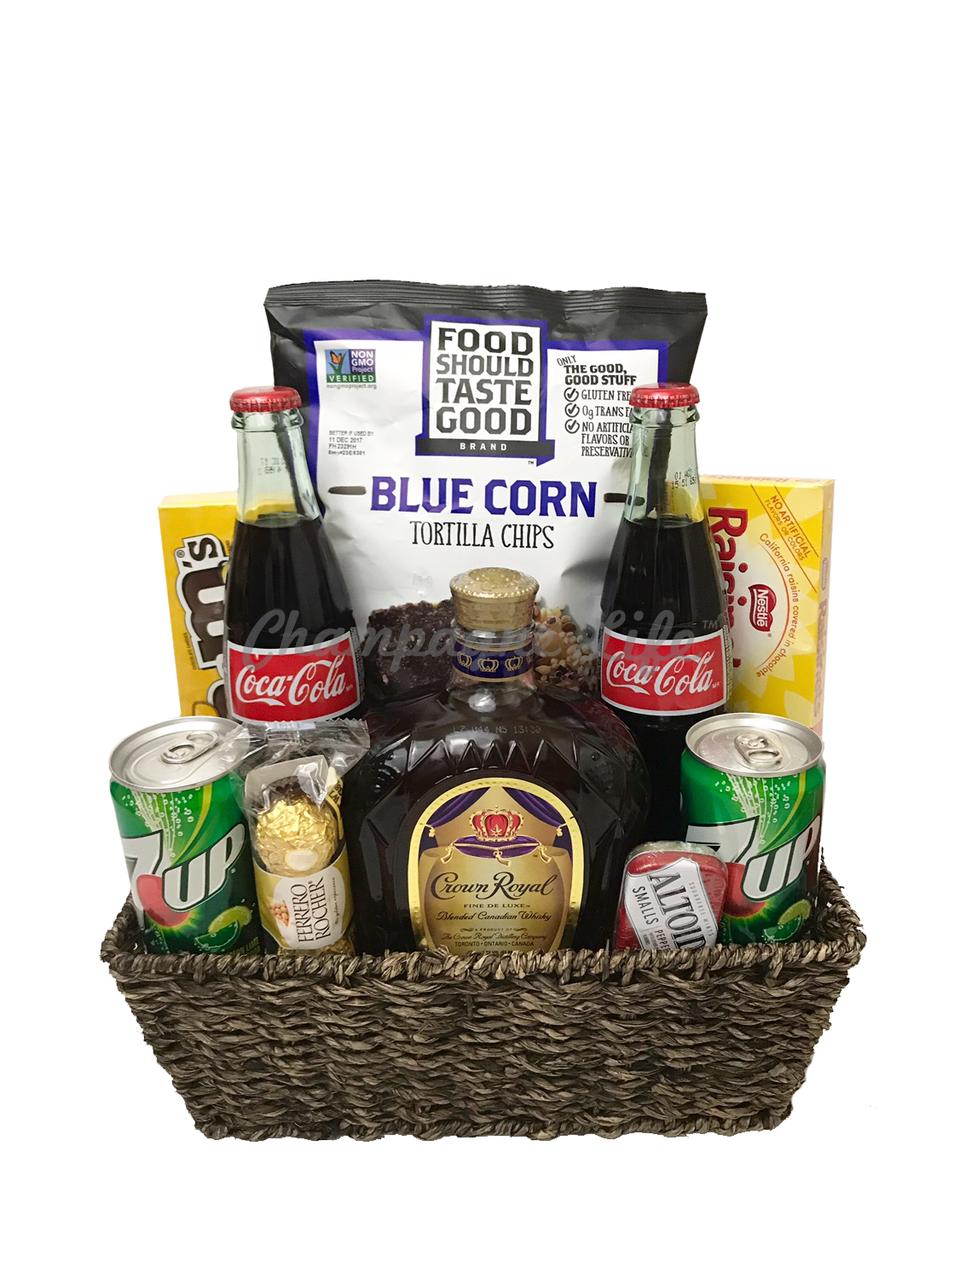 Crown Royal Gift Basket  sc 1 st  Ch&agne Life Gift Baskets & Crown Royal Gift Basket - Champagne Life Gift Baskets